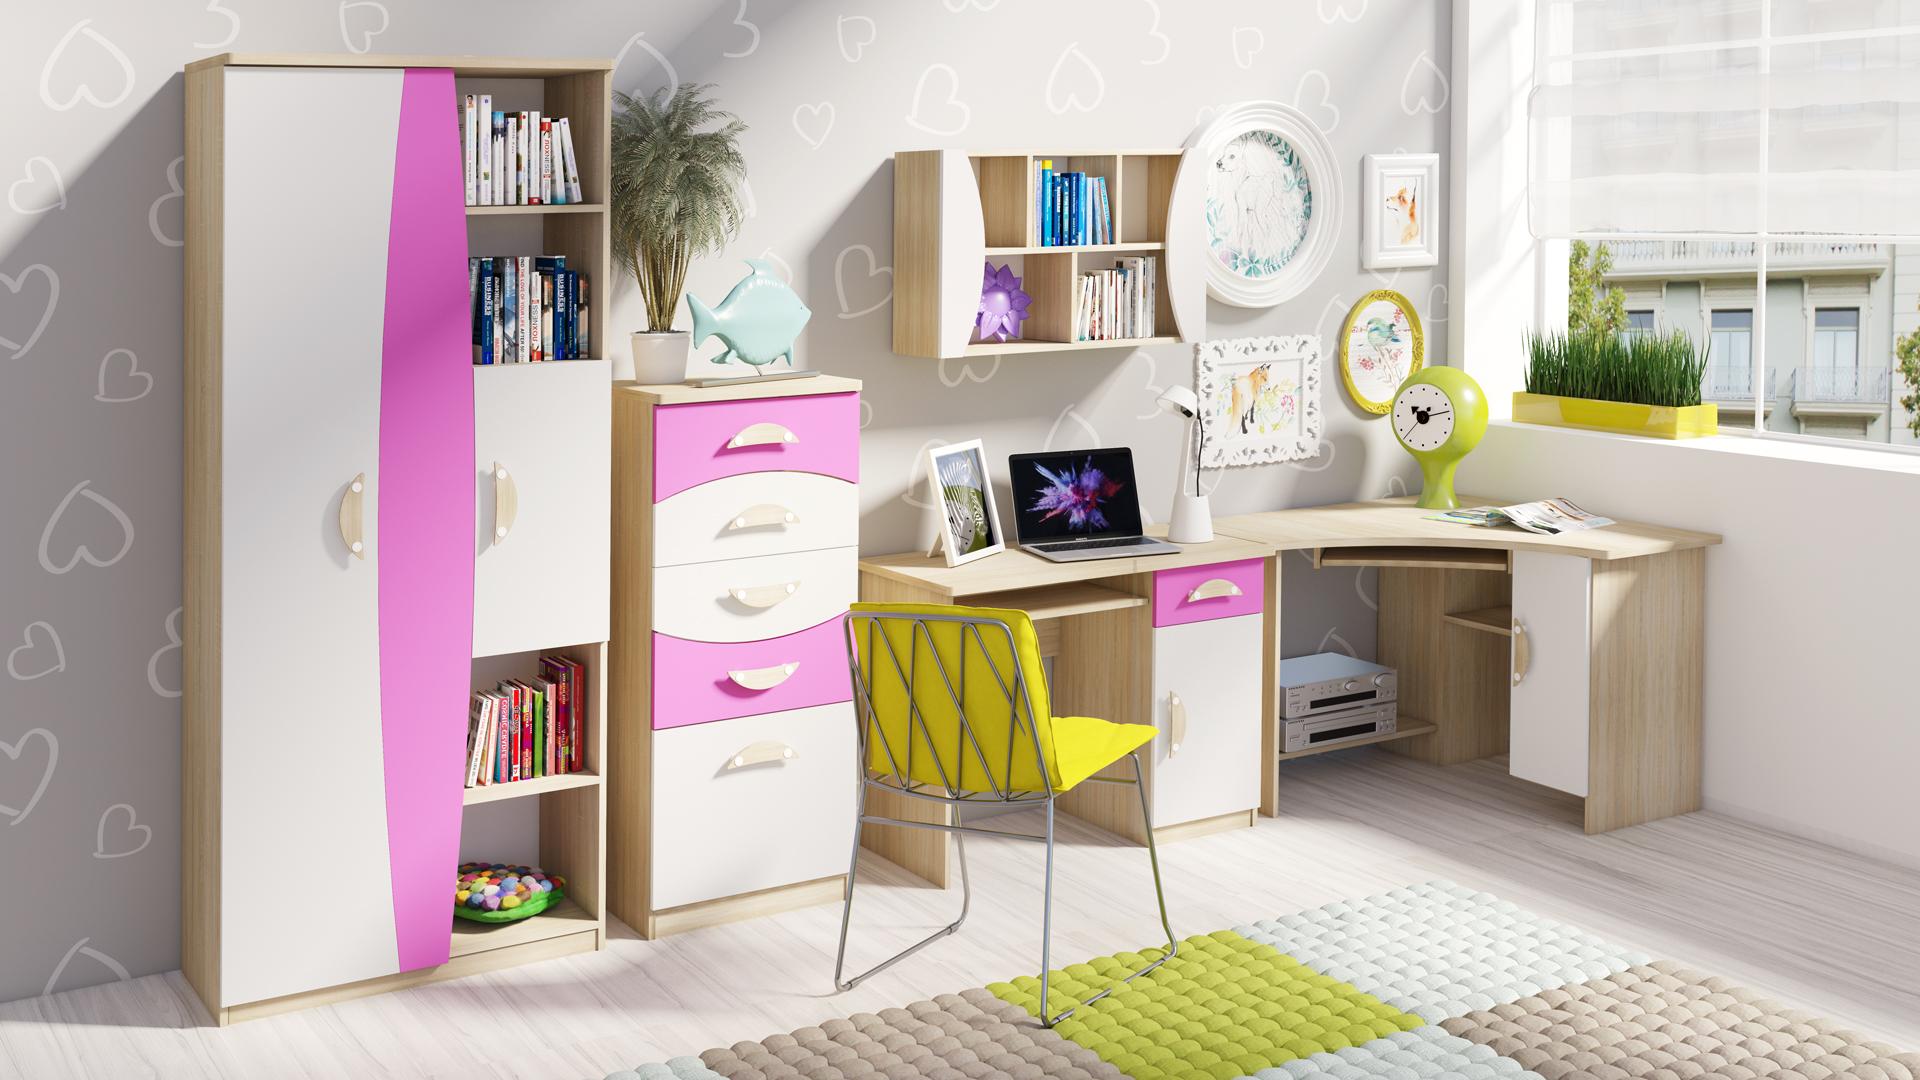 MEBLINE Stylový nábytek do dětského pokoje TENUS II Sestava 3